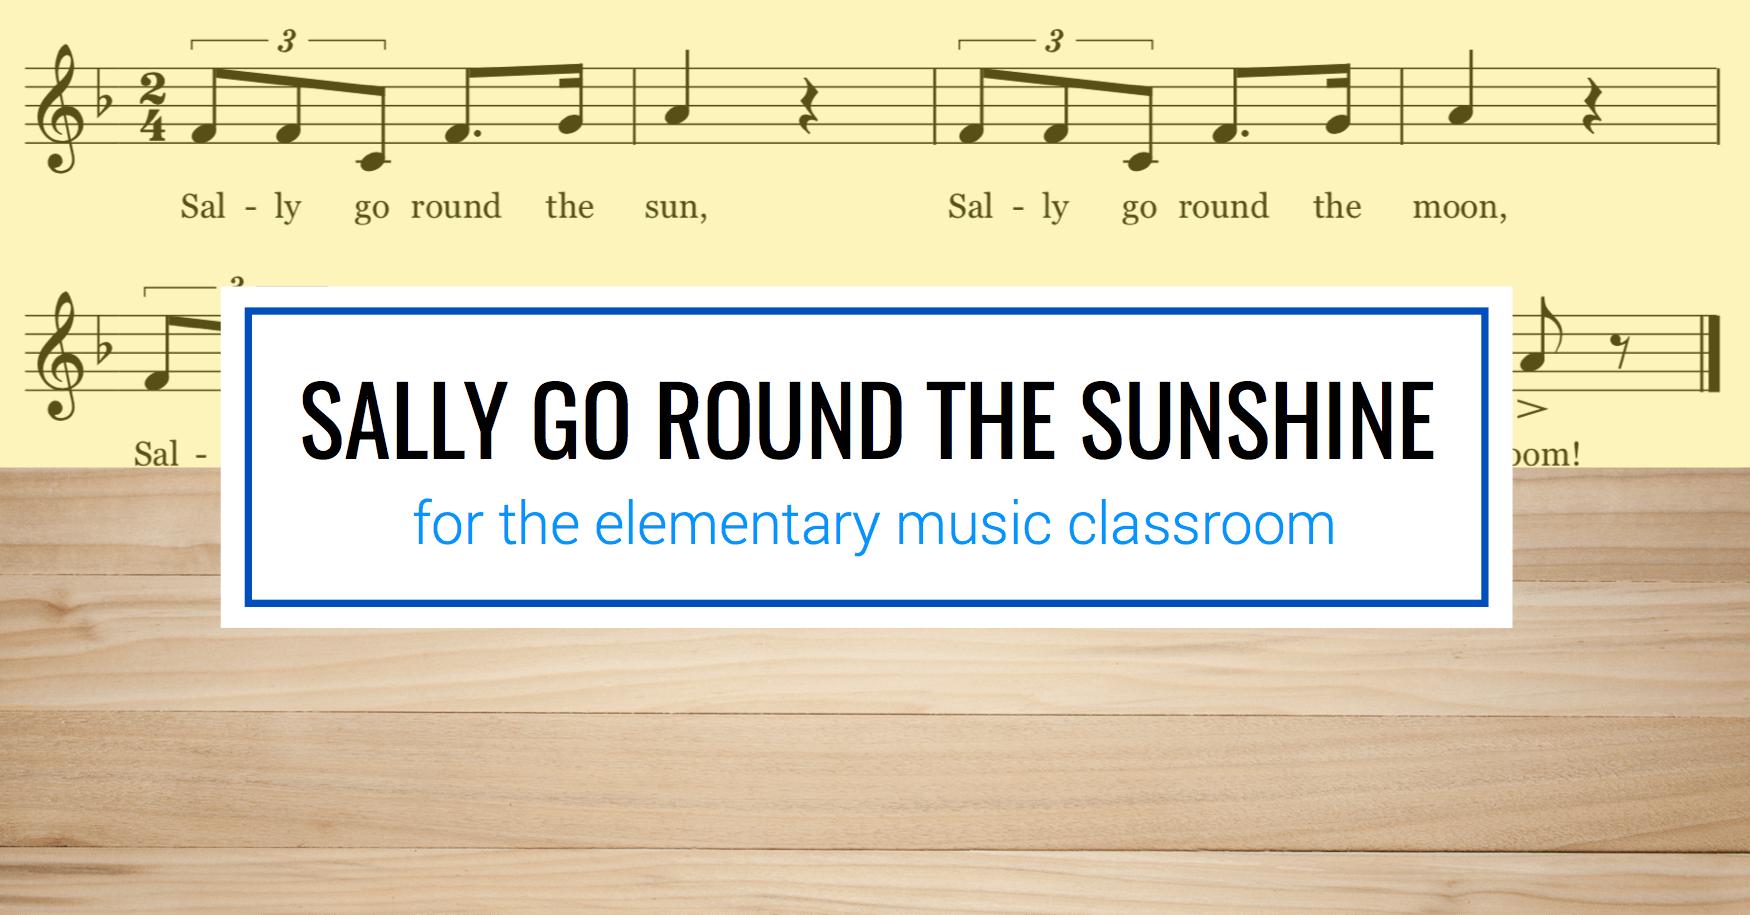 Sally Go Round the Sunshine